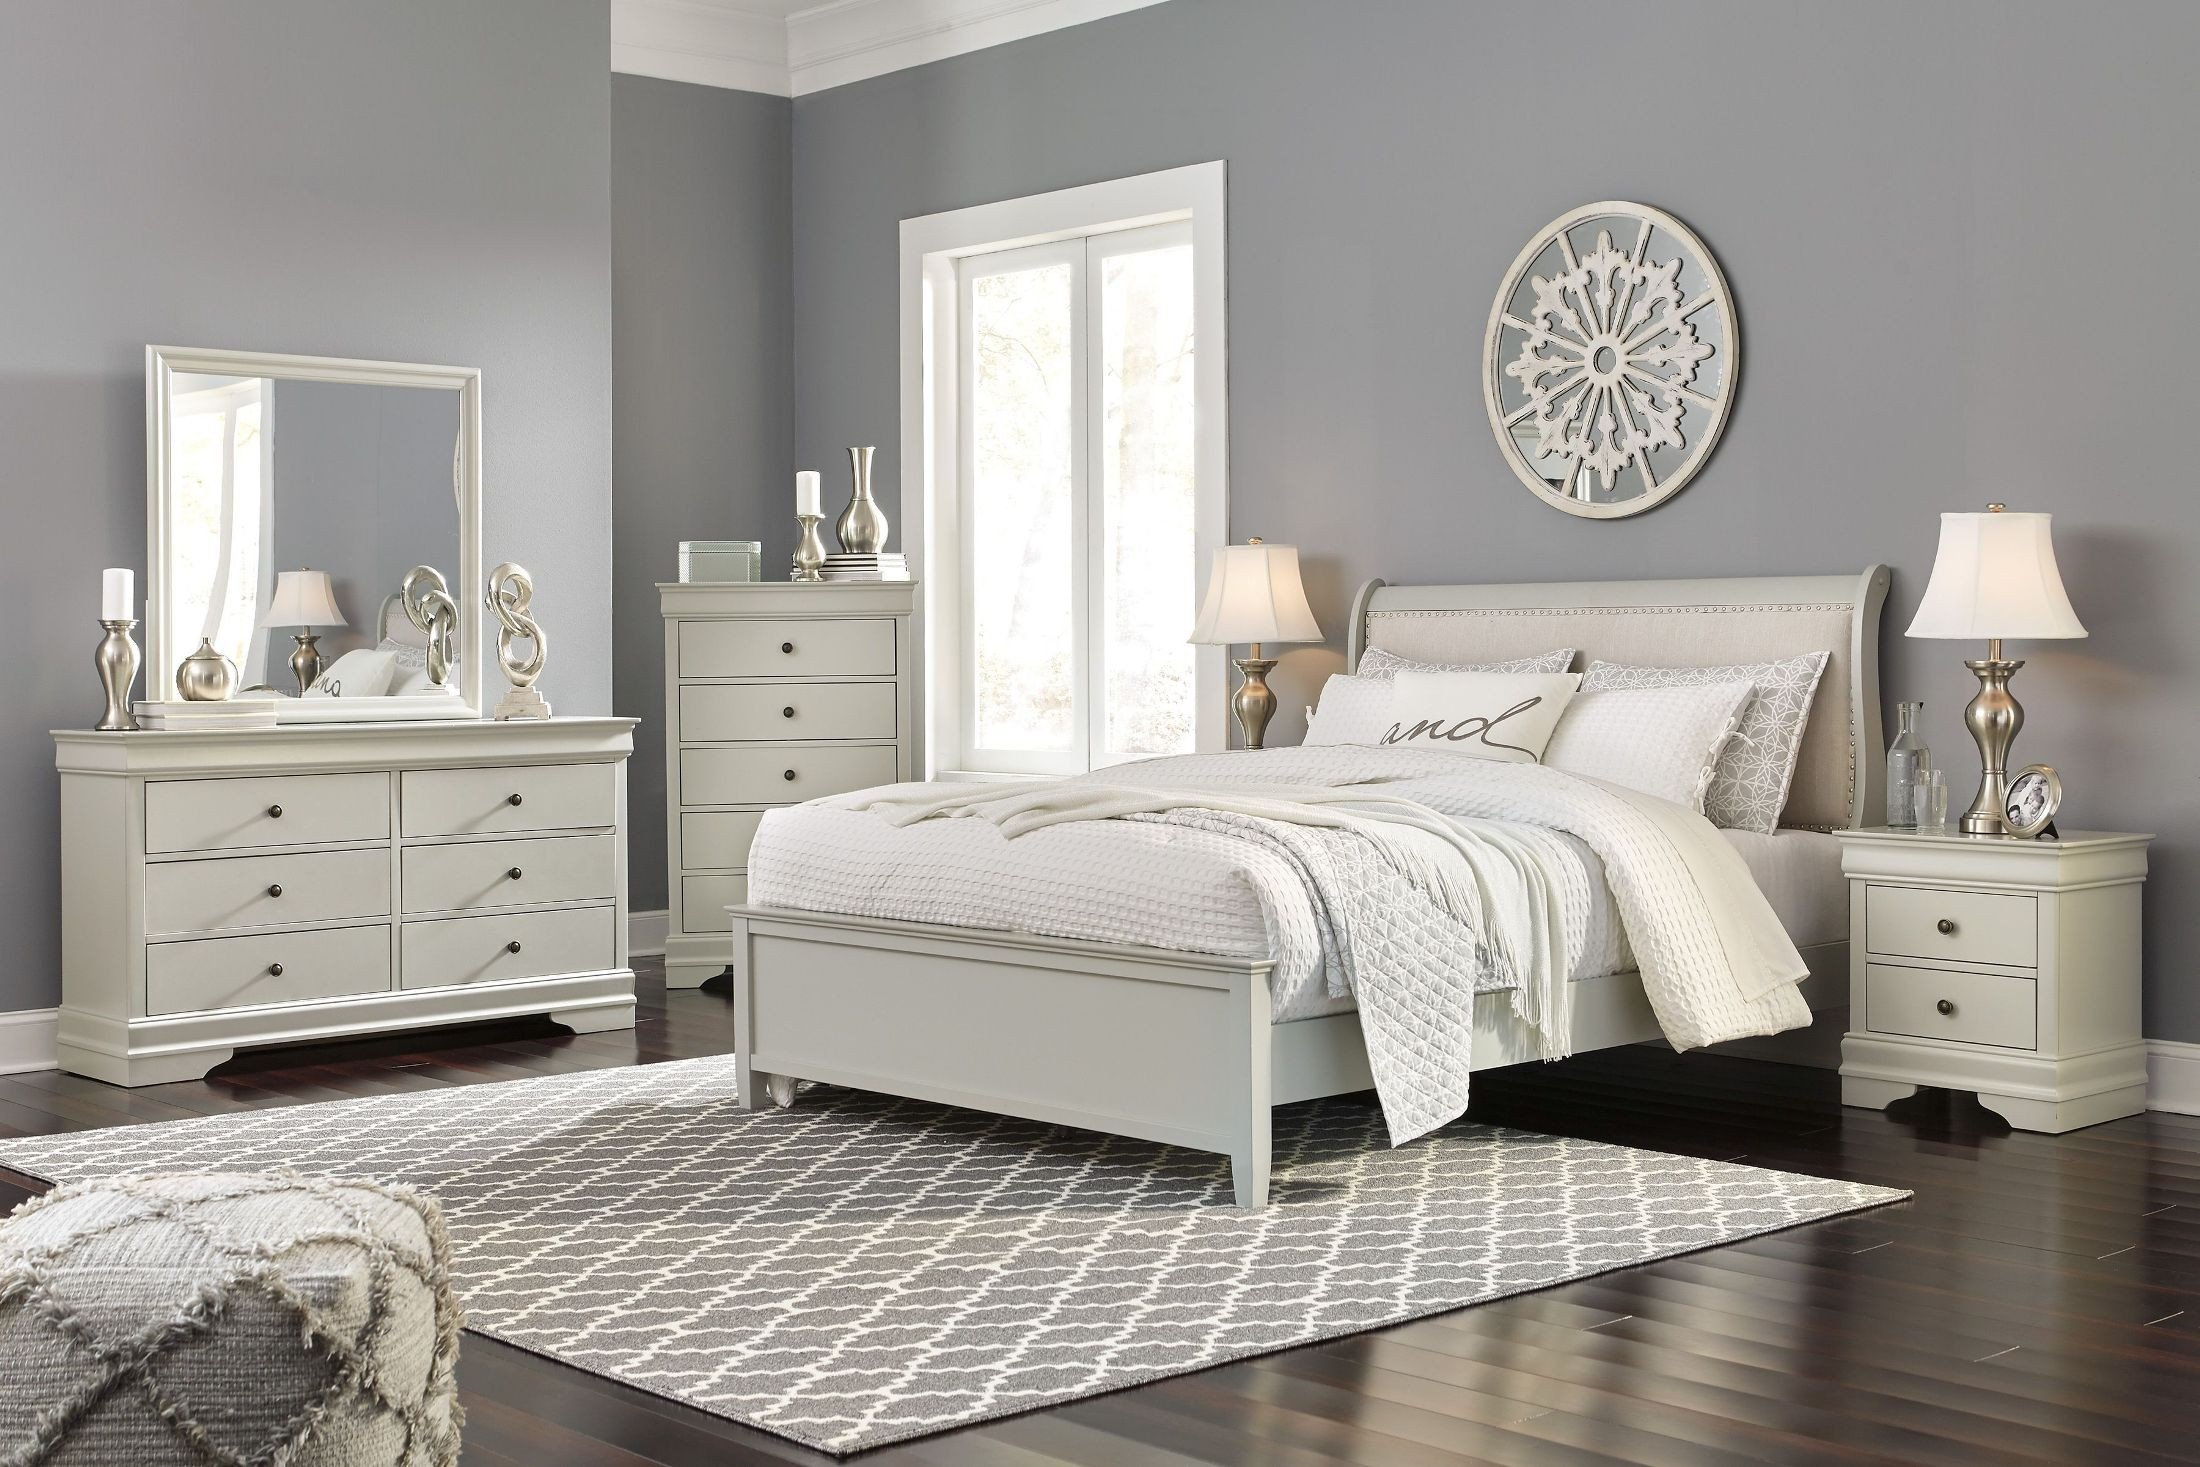 Acme Furniture Bedroom Set Elegant Emma Mason Signature Jarred 5 Piece Sleigh Bedroom Set In Gray